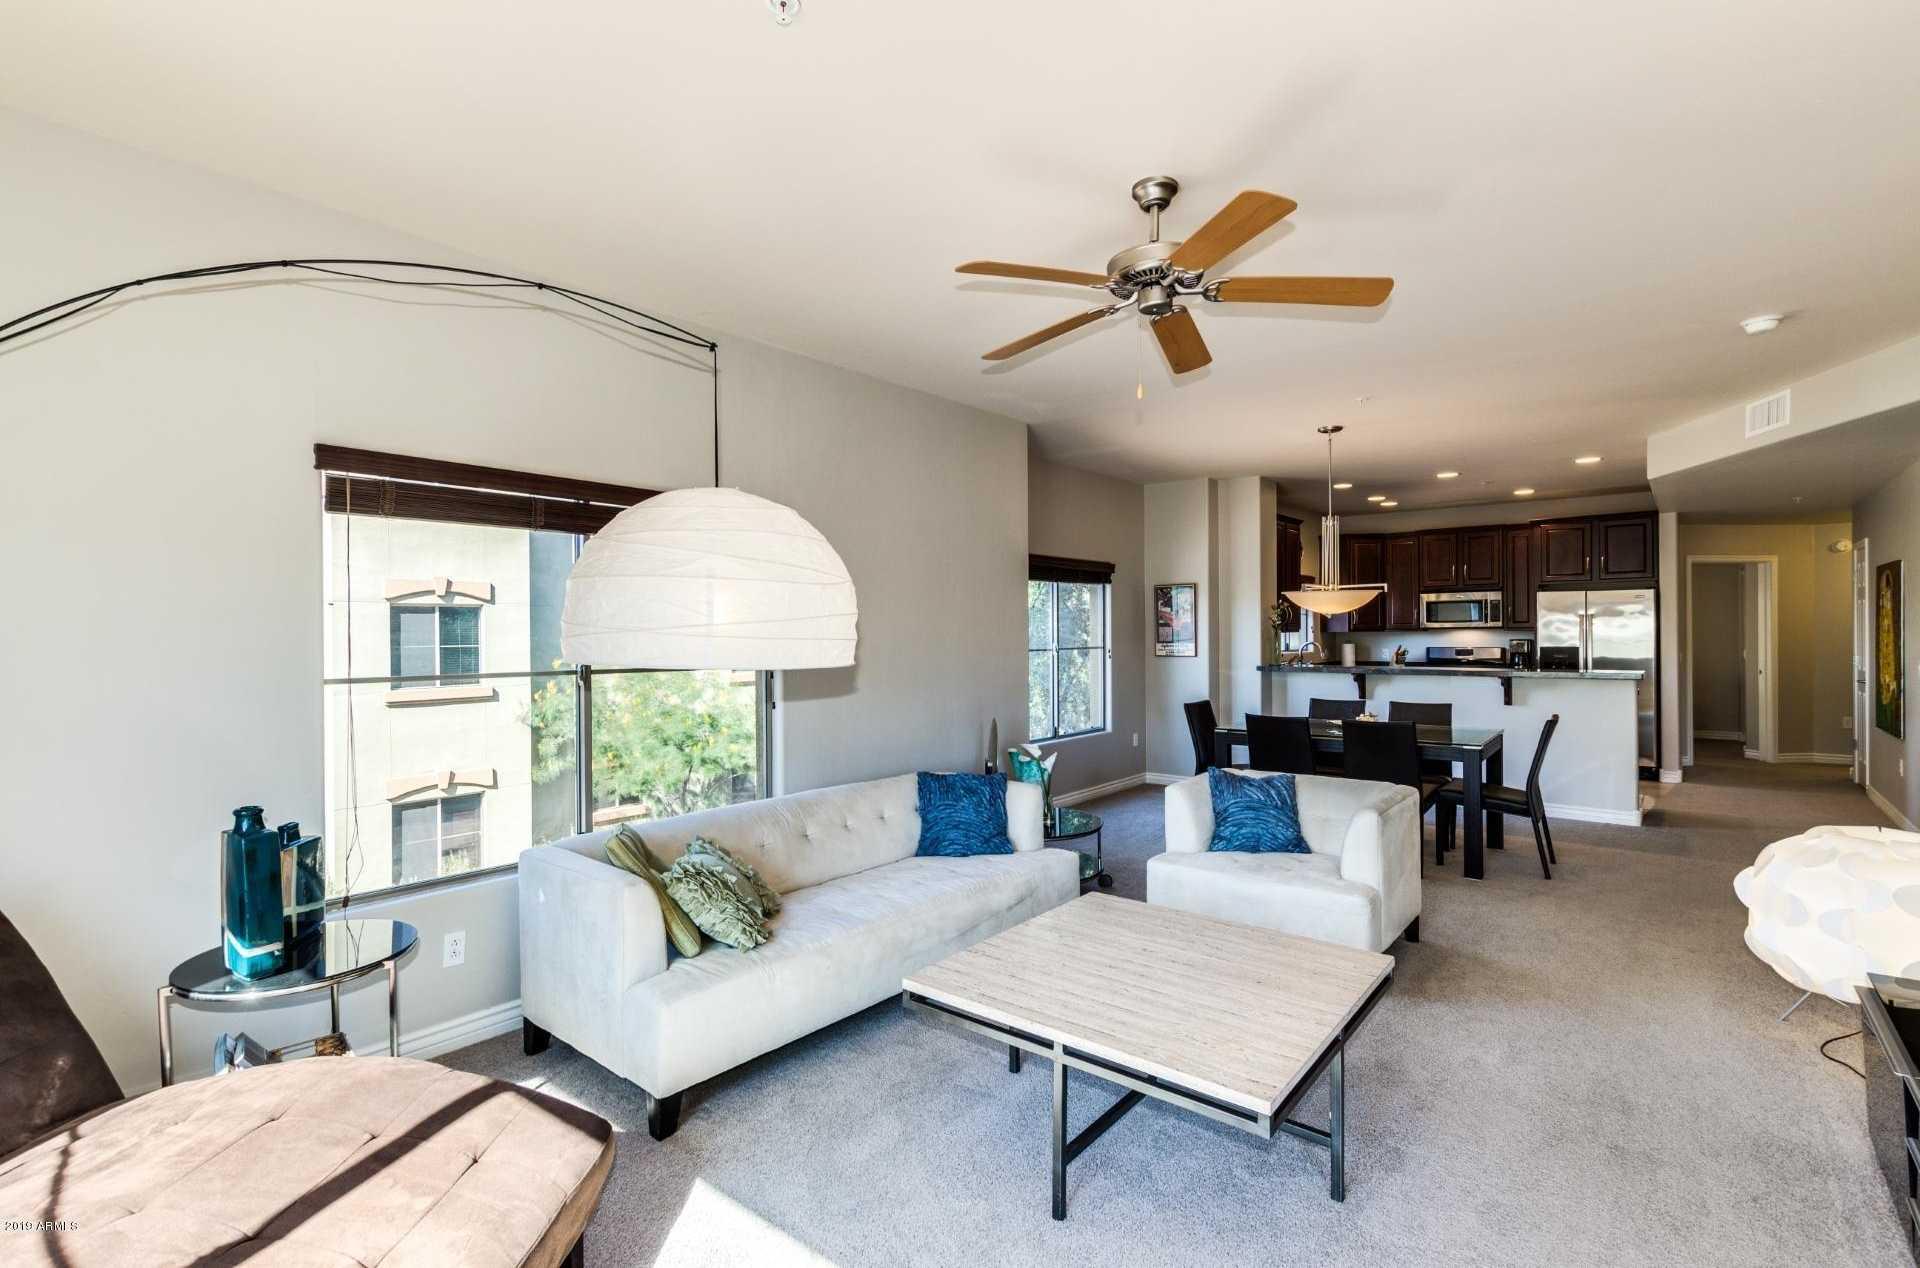 $324,900 - 2Br/2Ba -  for Sale in Toscana At Desert Ridge Condominium 2nd Amd, Phoenix